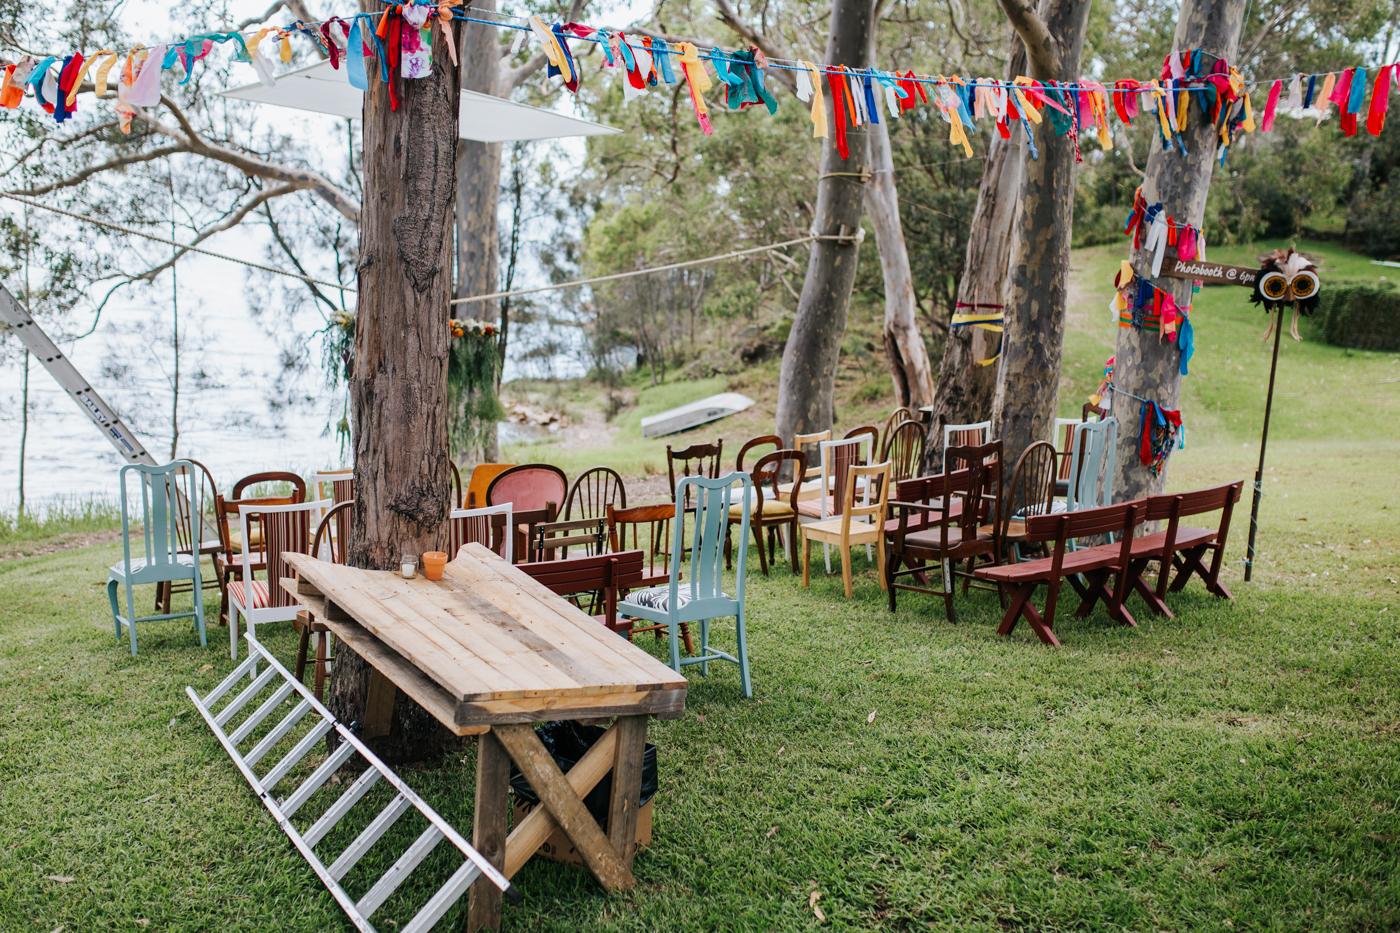 Emma & Ben - Lake Macquarie - Hunter Valley Wedding - Samantha Heather Photography-10.jpg